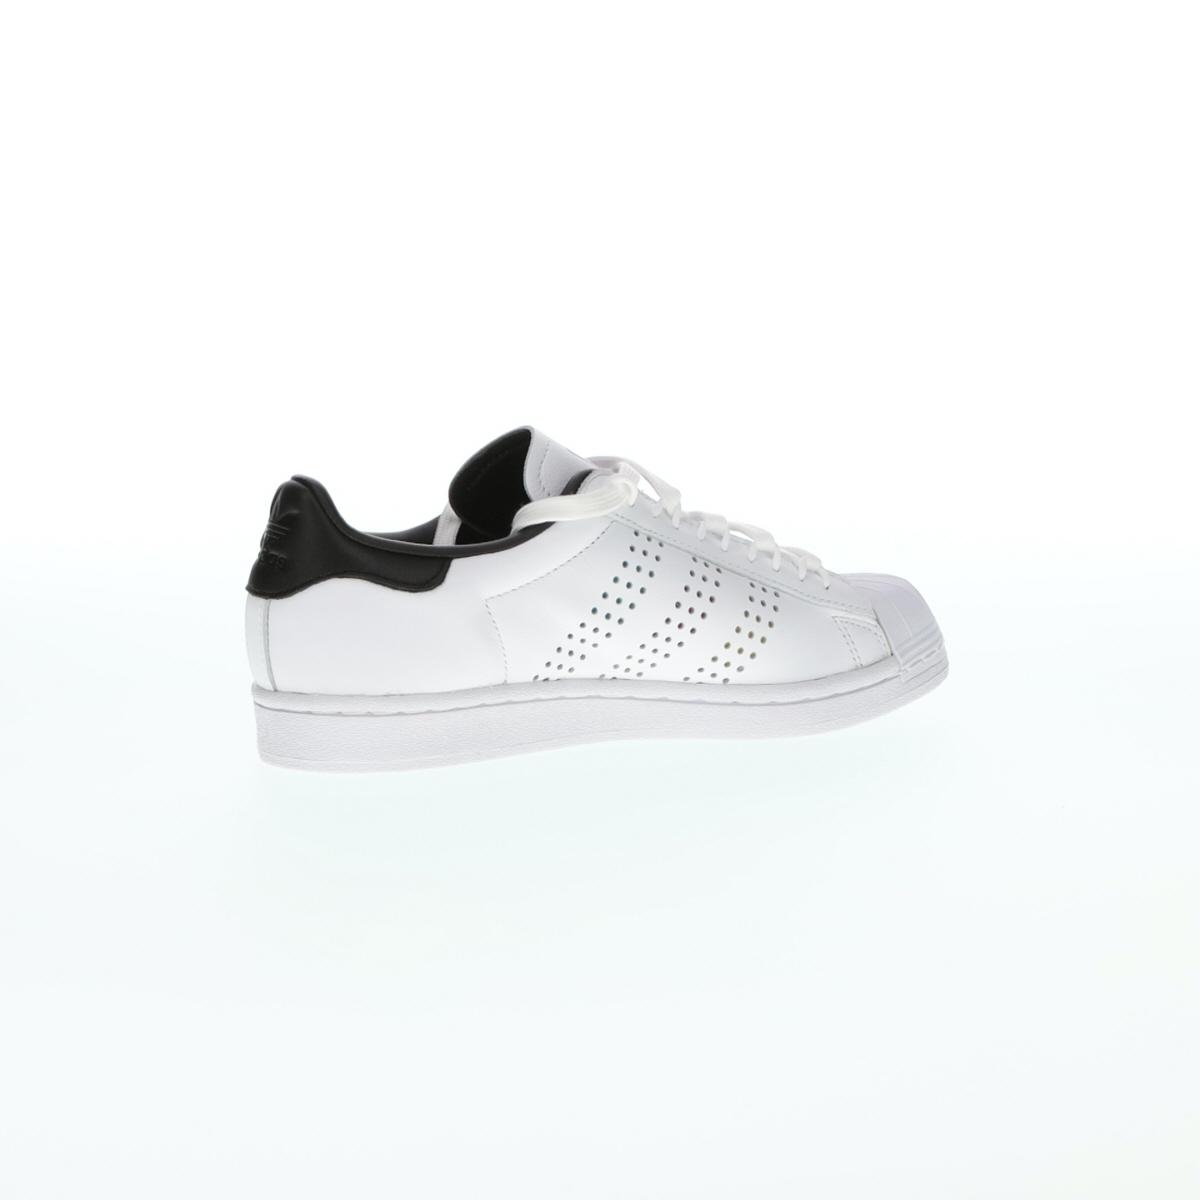 adidas lazy slippers shoes amazon kids